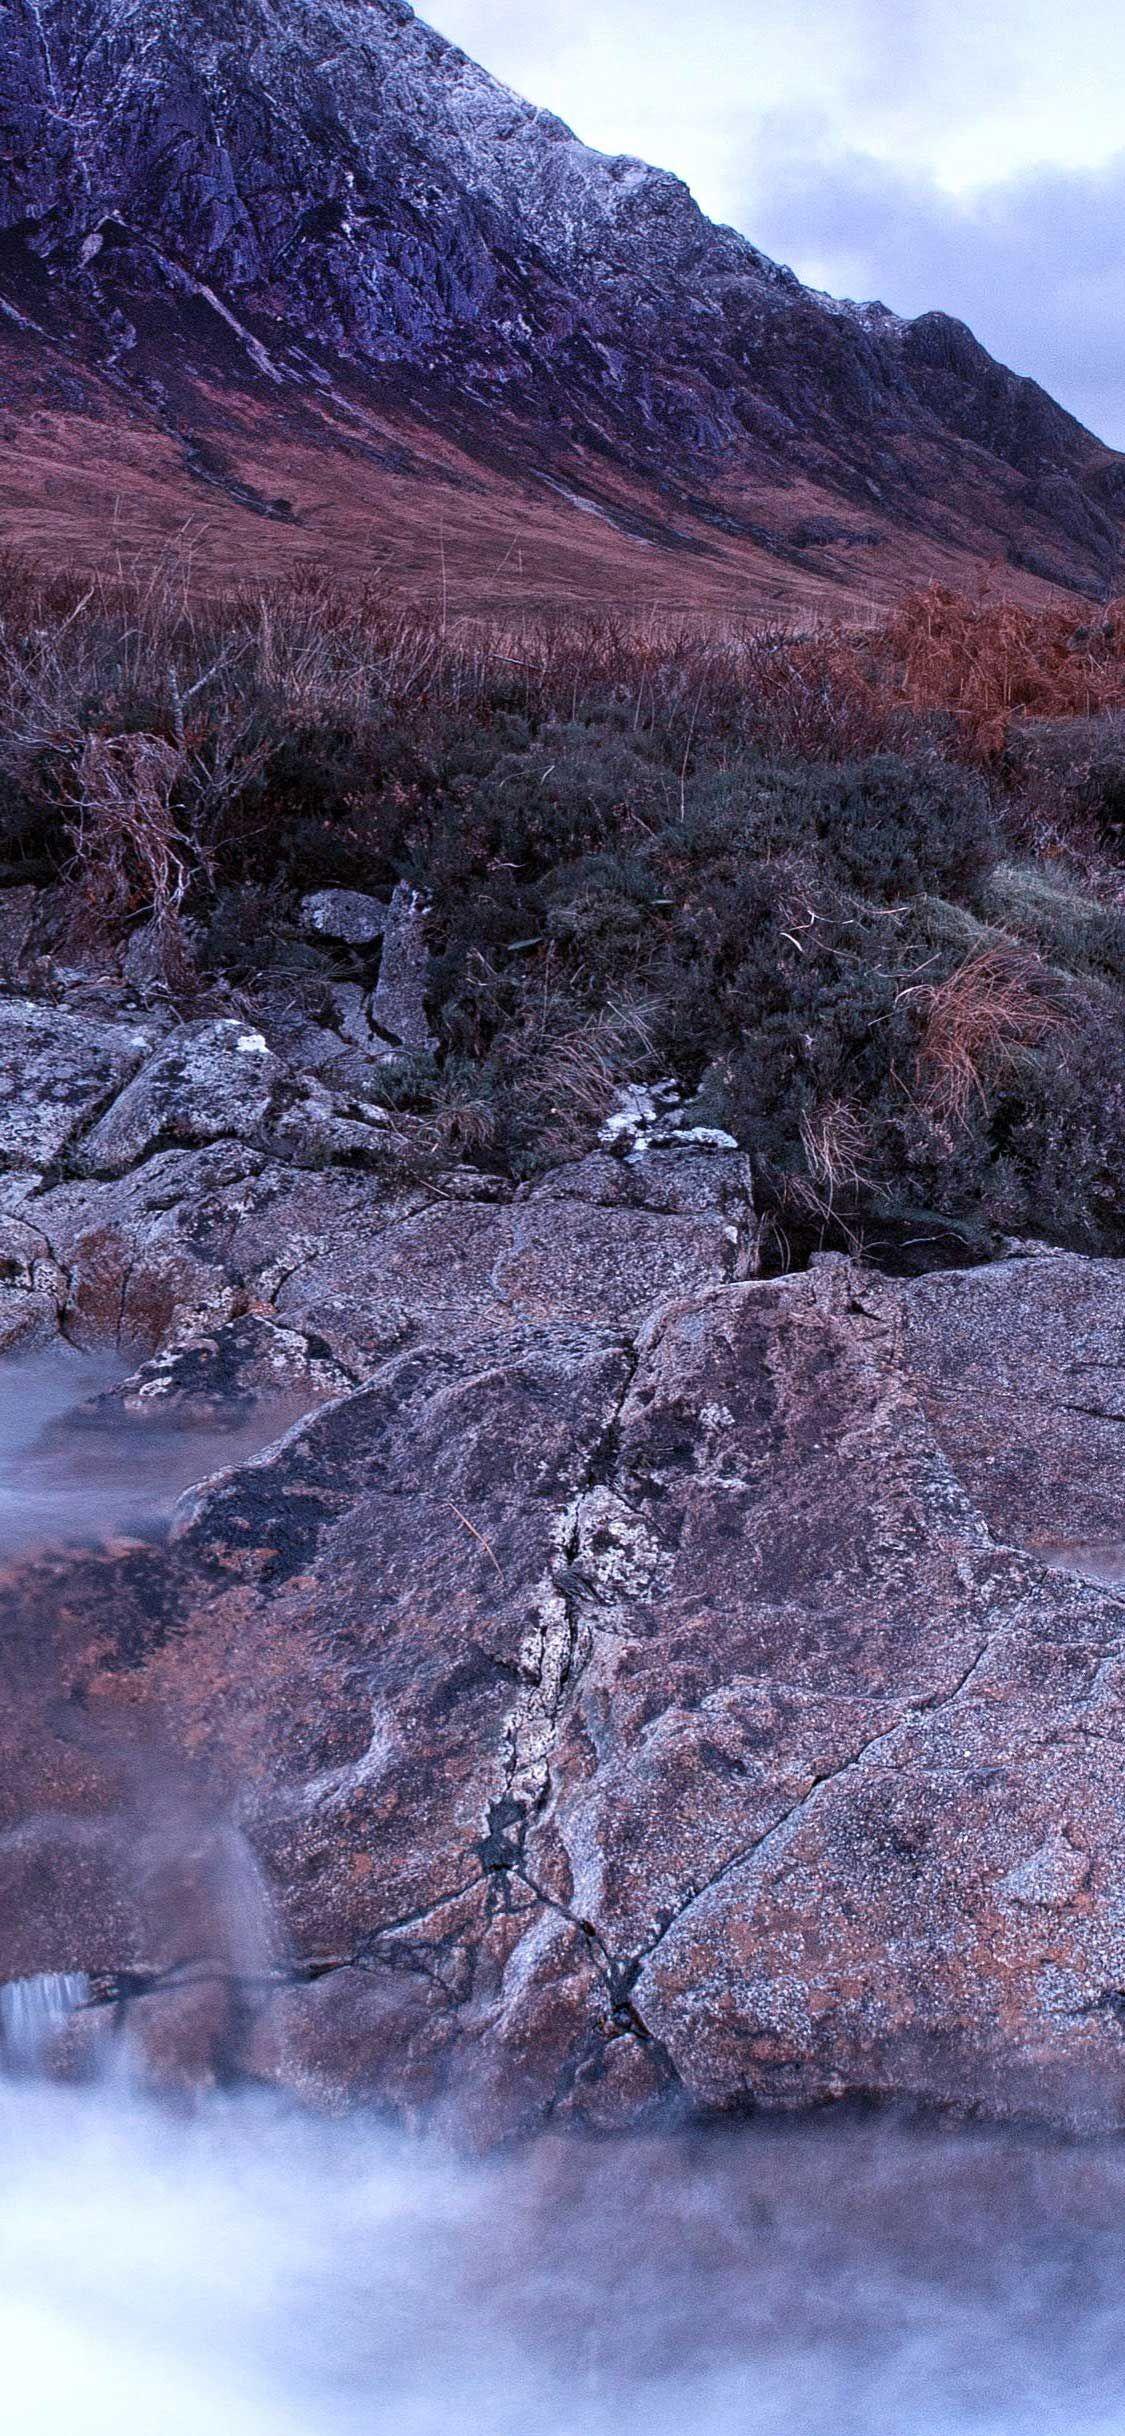 Iphone Pro Wallpaper River scotland brown black mountain